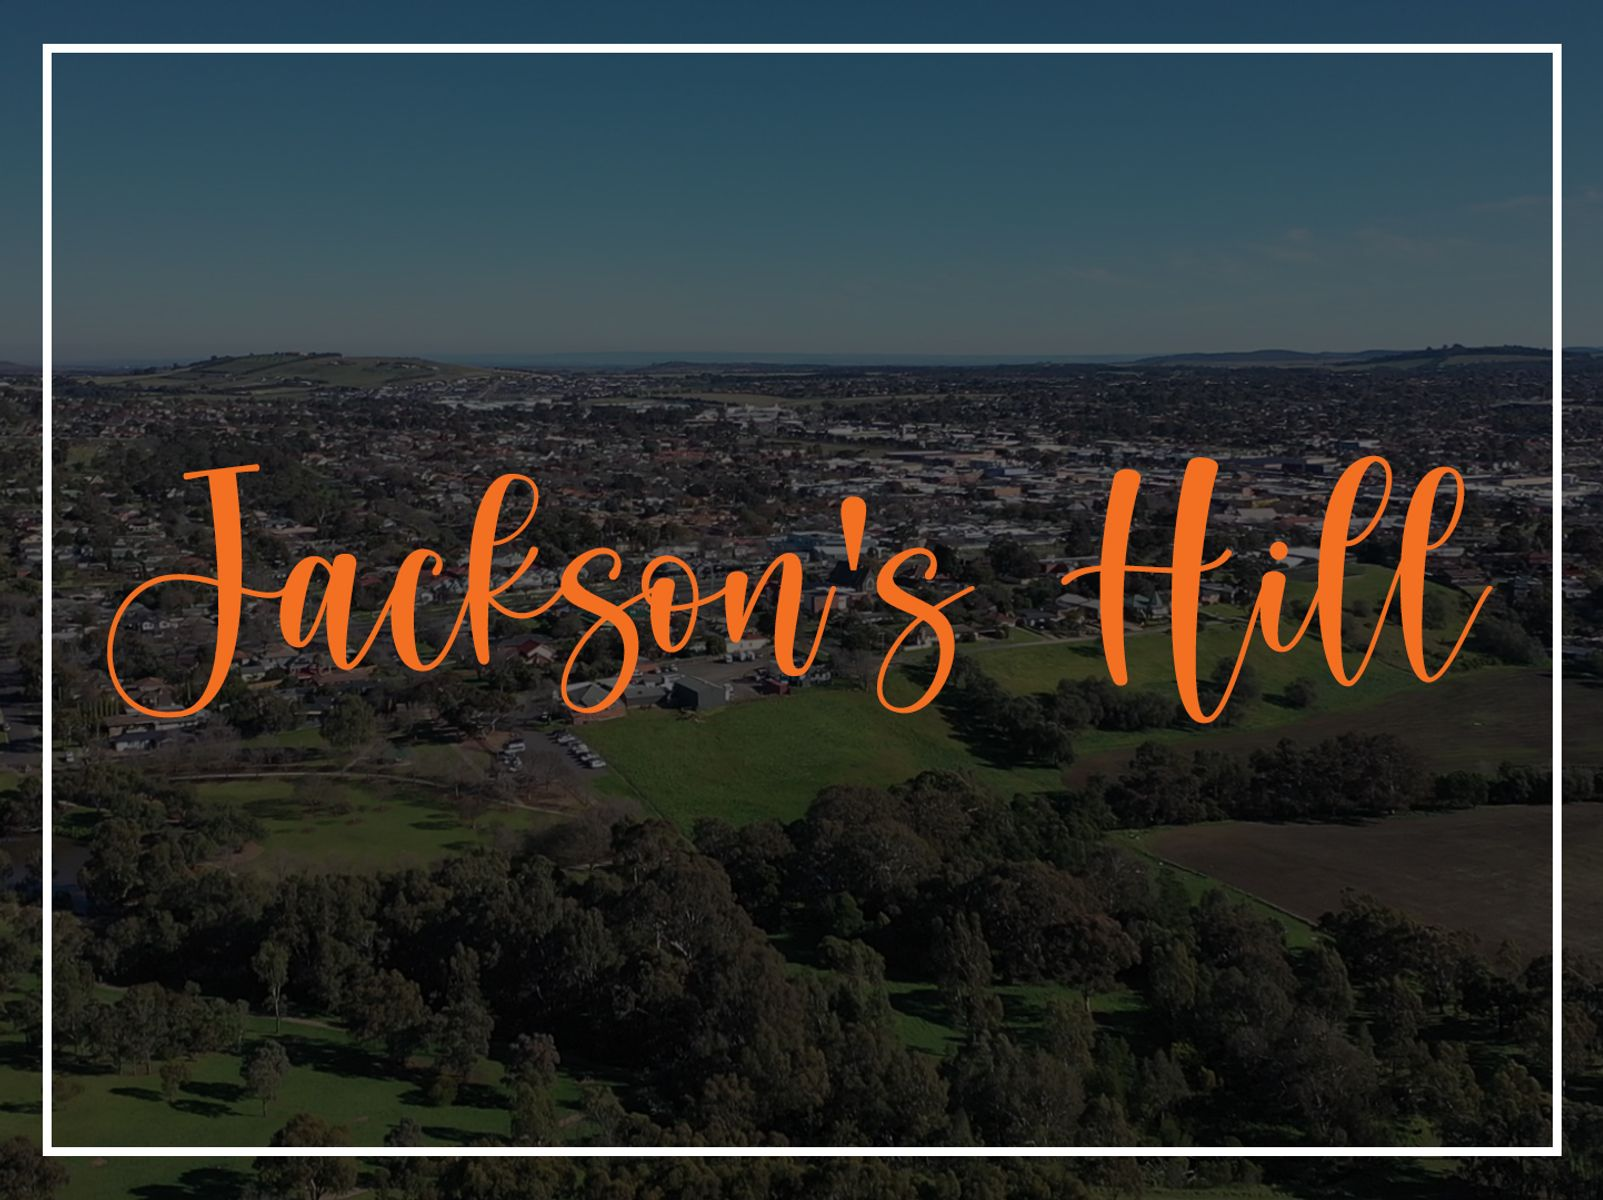 Jackson's Hill